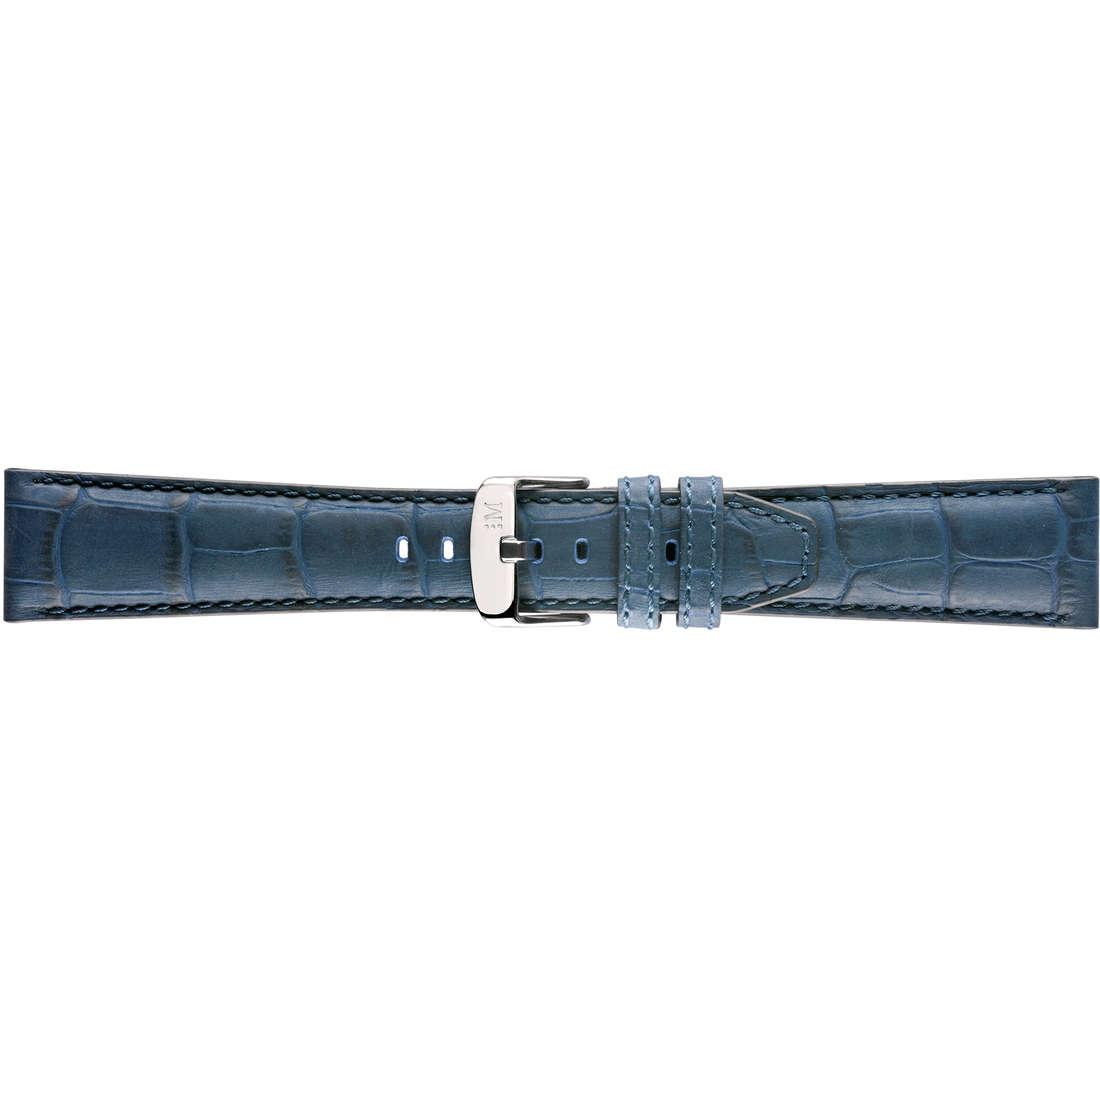 watch watch bands watch straps man Morellato Linea Sport A01X4497B44062CR18